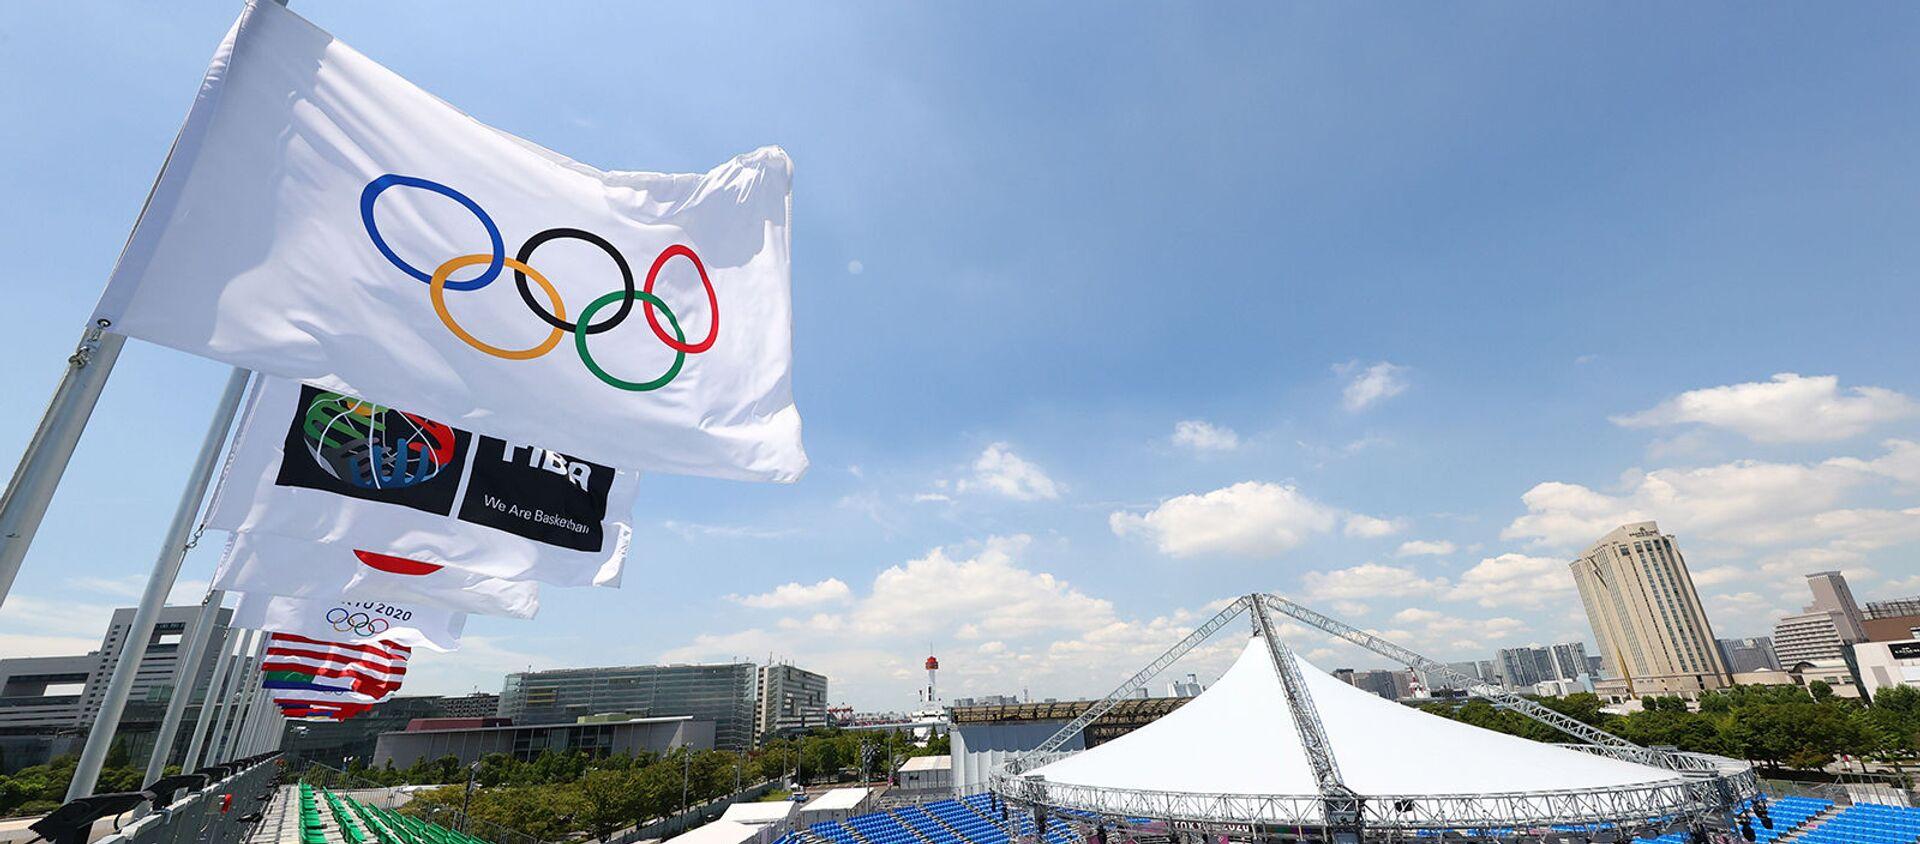 Олимпийские флаги на стадионе спортивного парка Аоми в Токио - Sputnik Արմենիա, 1920, 31.07.2021